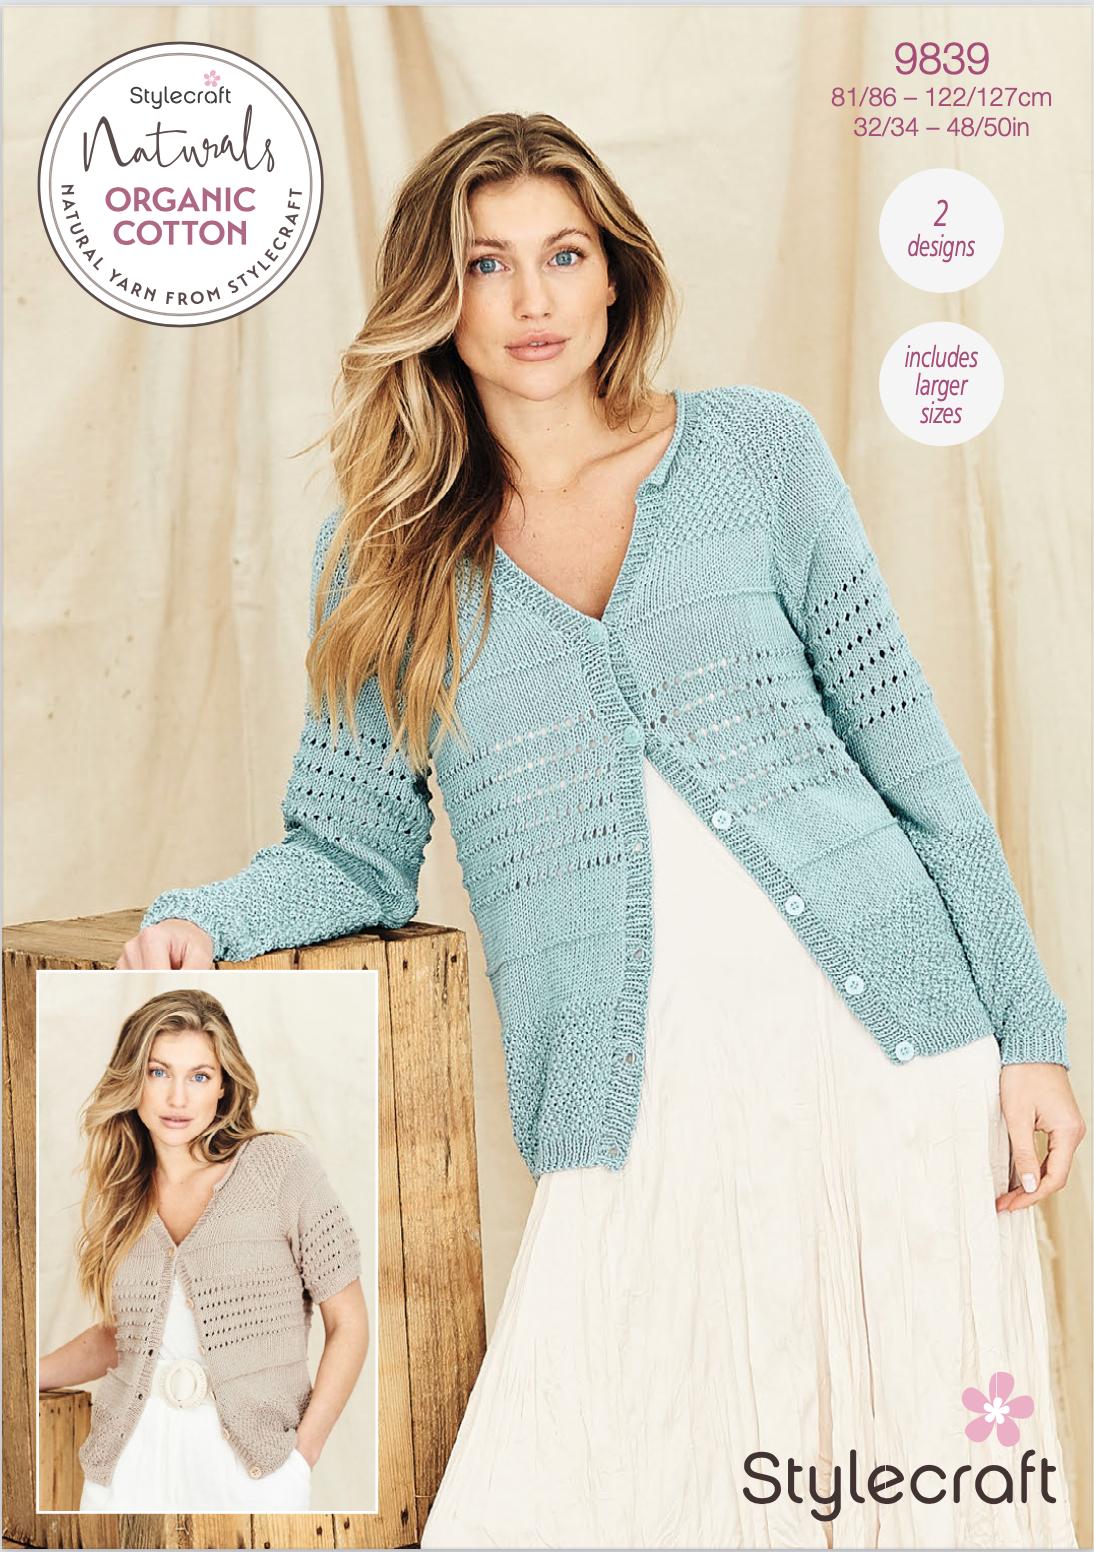 Stylecraft Pattern Naturals Organic Cotton 9839 (download) product image